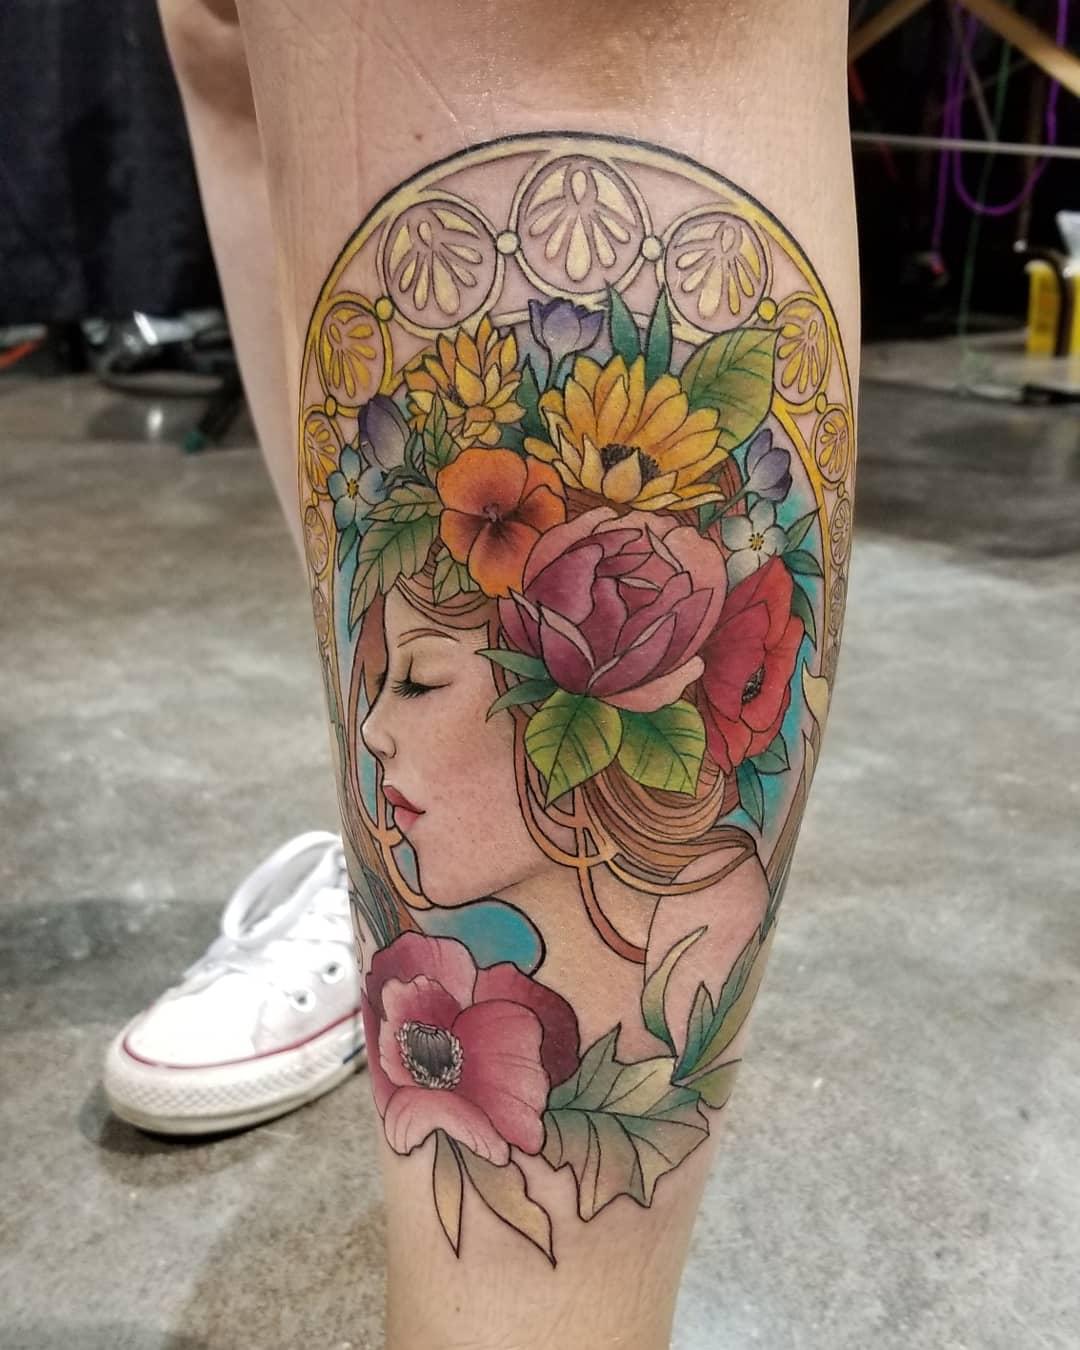 Kaitlin Matthews Tattoo 2019 Okanagan Tattoo Show & Brewfest Artist